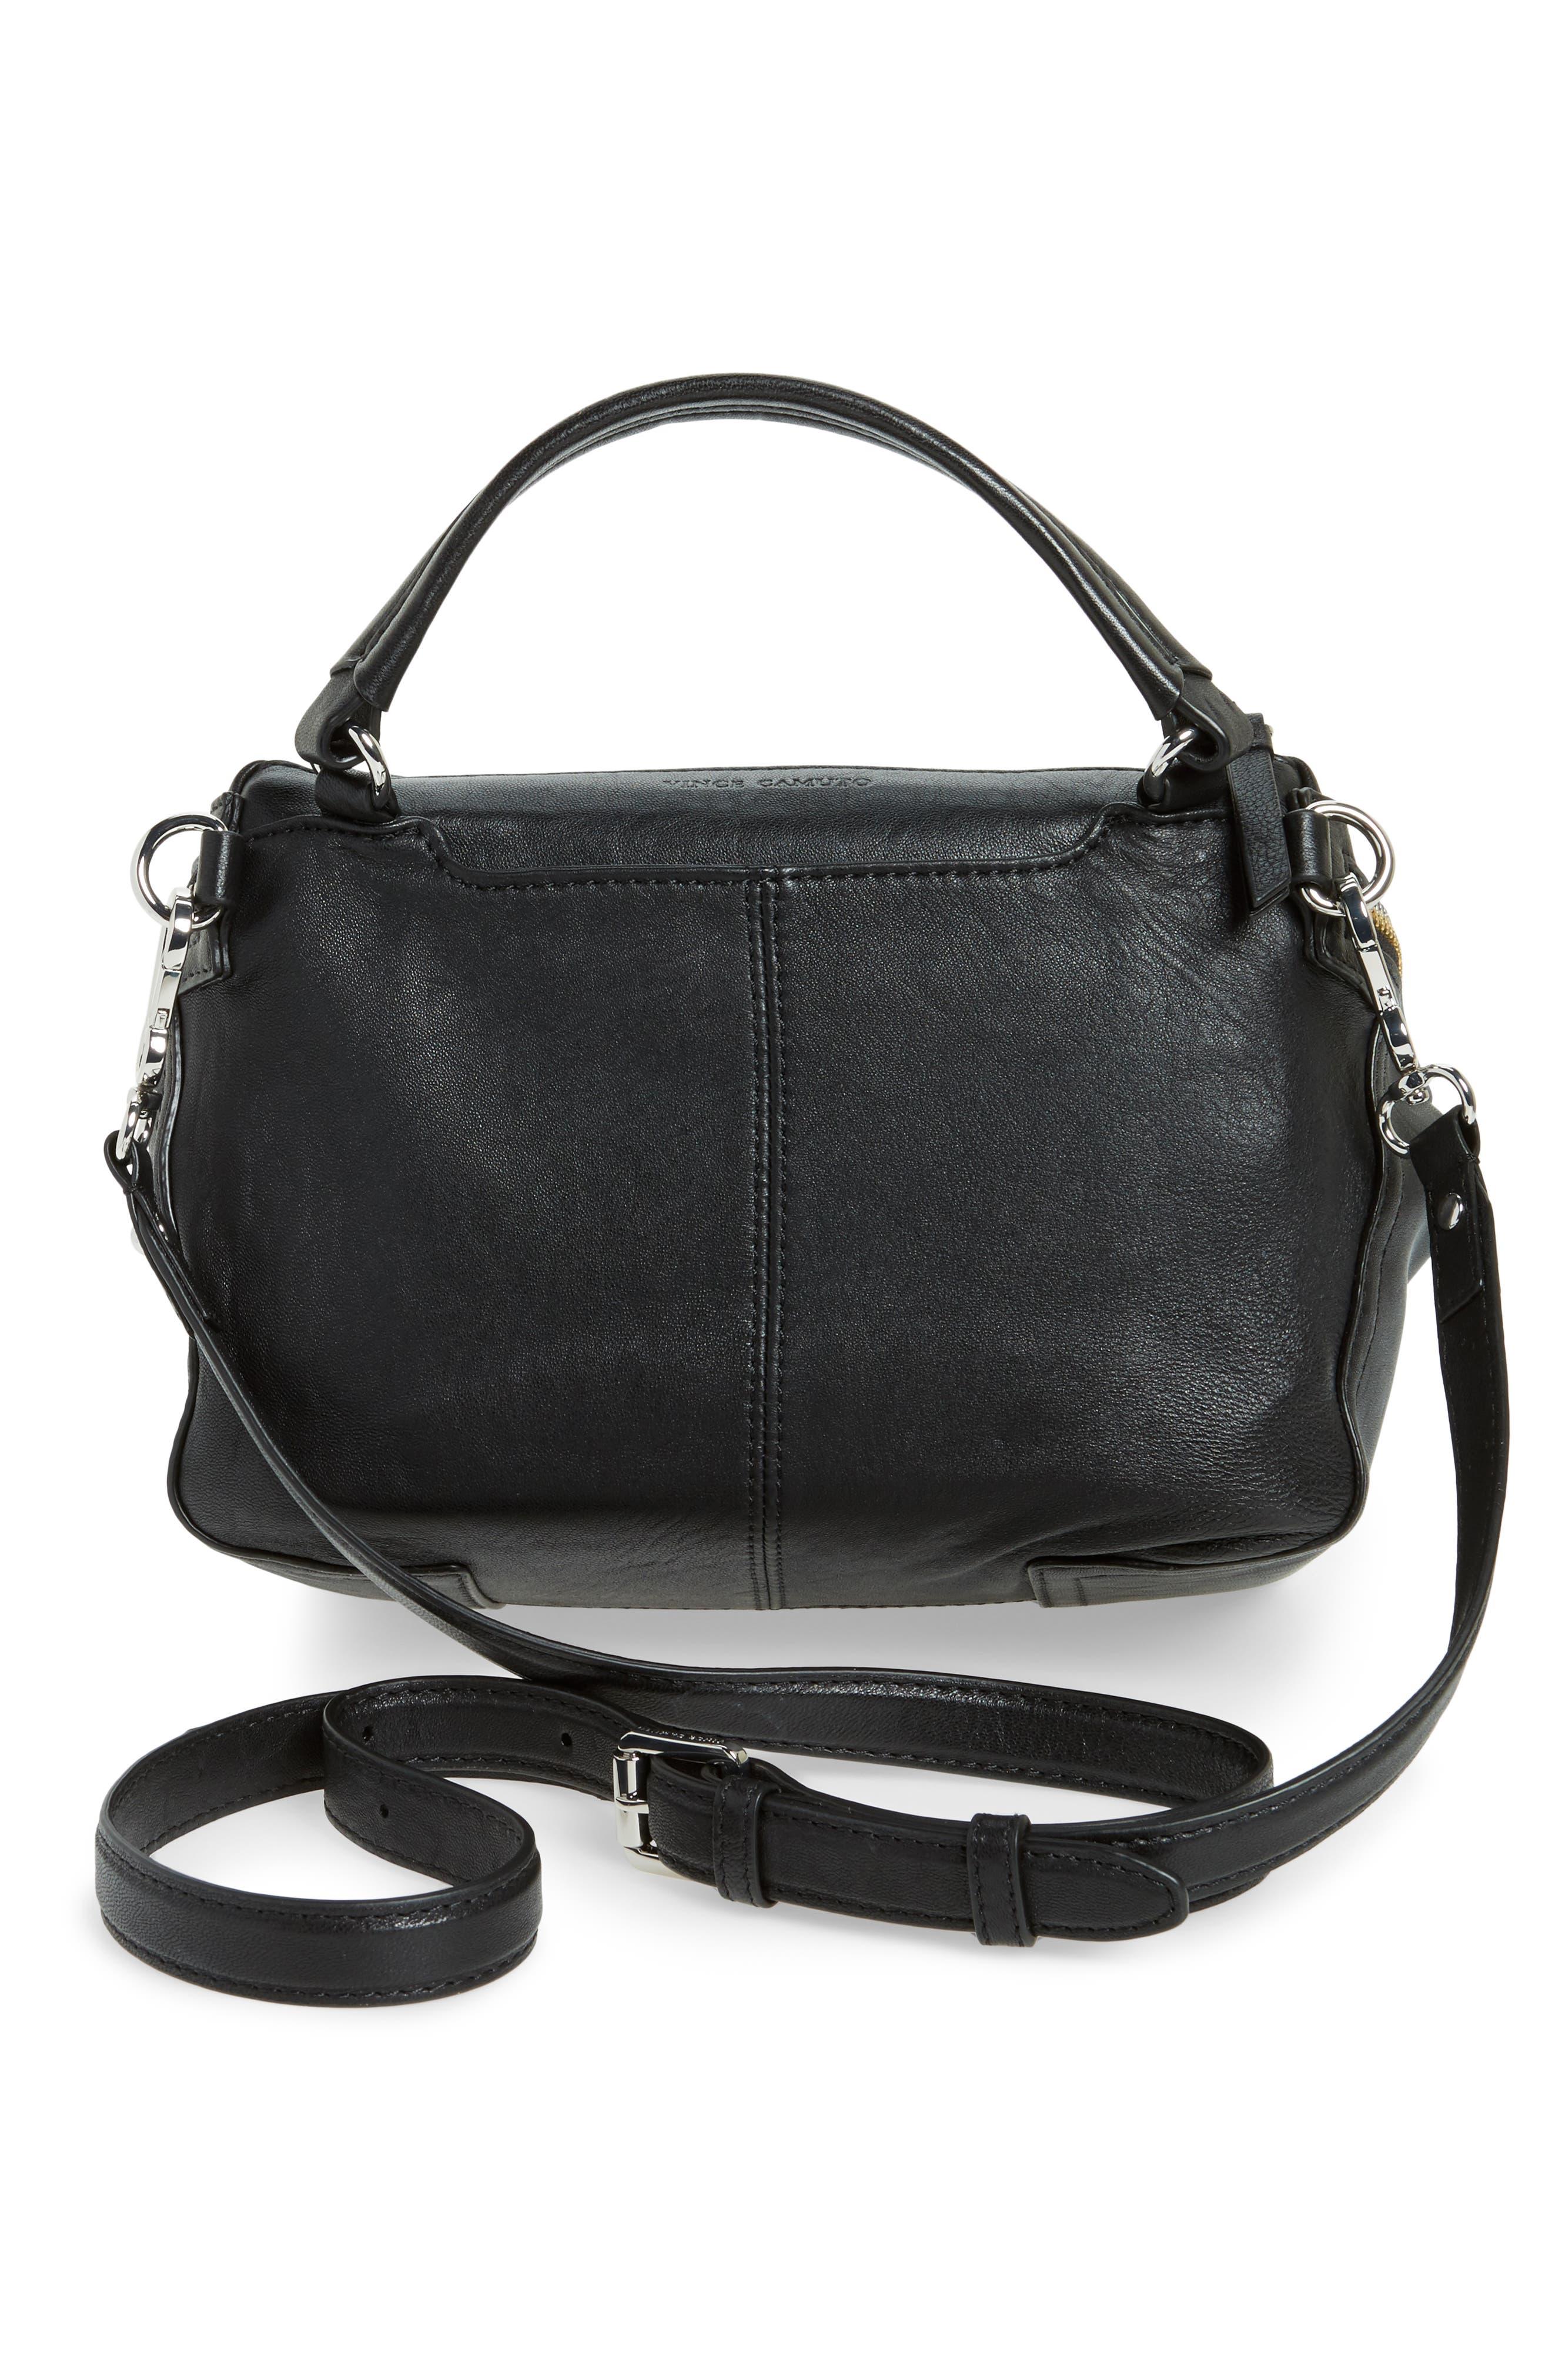 Medium Patch Leather Crossbody Bag,                             Alternate thumbnail 3, color,                             002